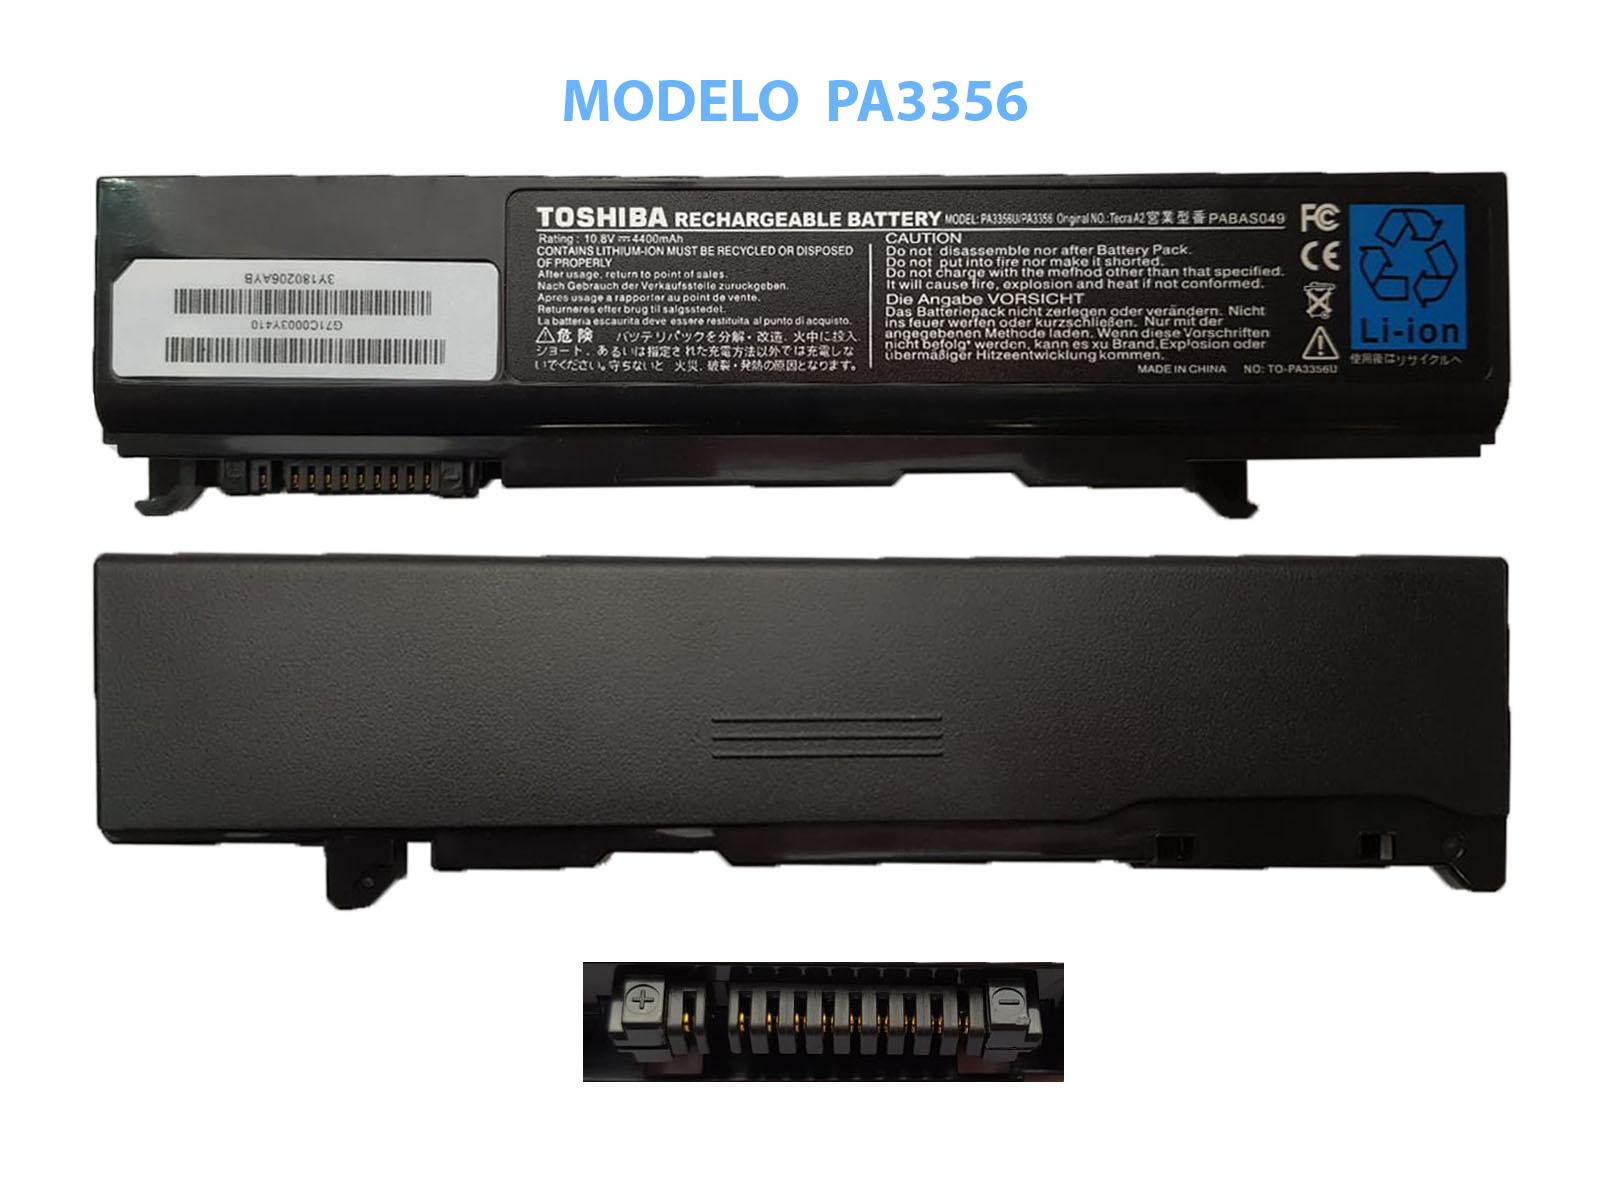 PRO02164